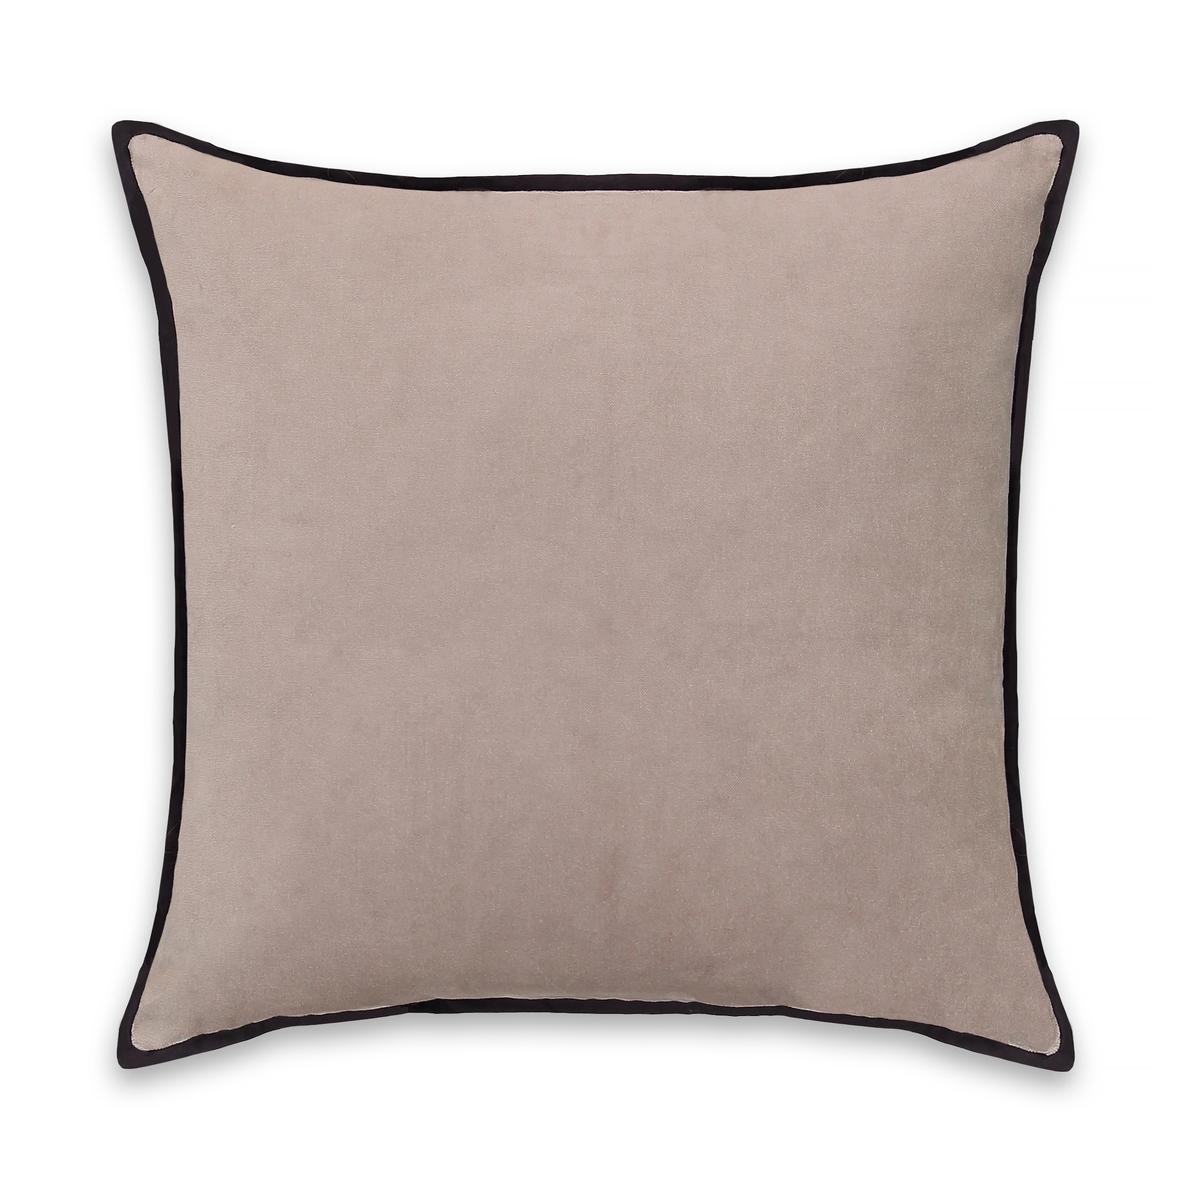 Чехол La Redoute На подушку-валик из велюра Vlivole 50 x 30 см серый наволочка la redoute flooch 50 x 30 см бежевый